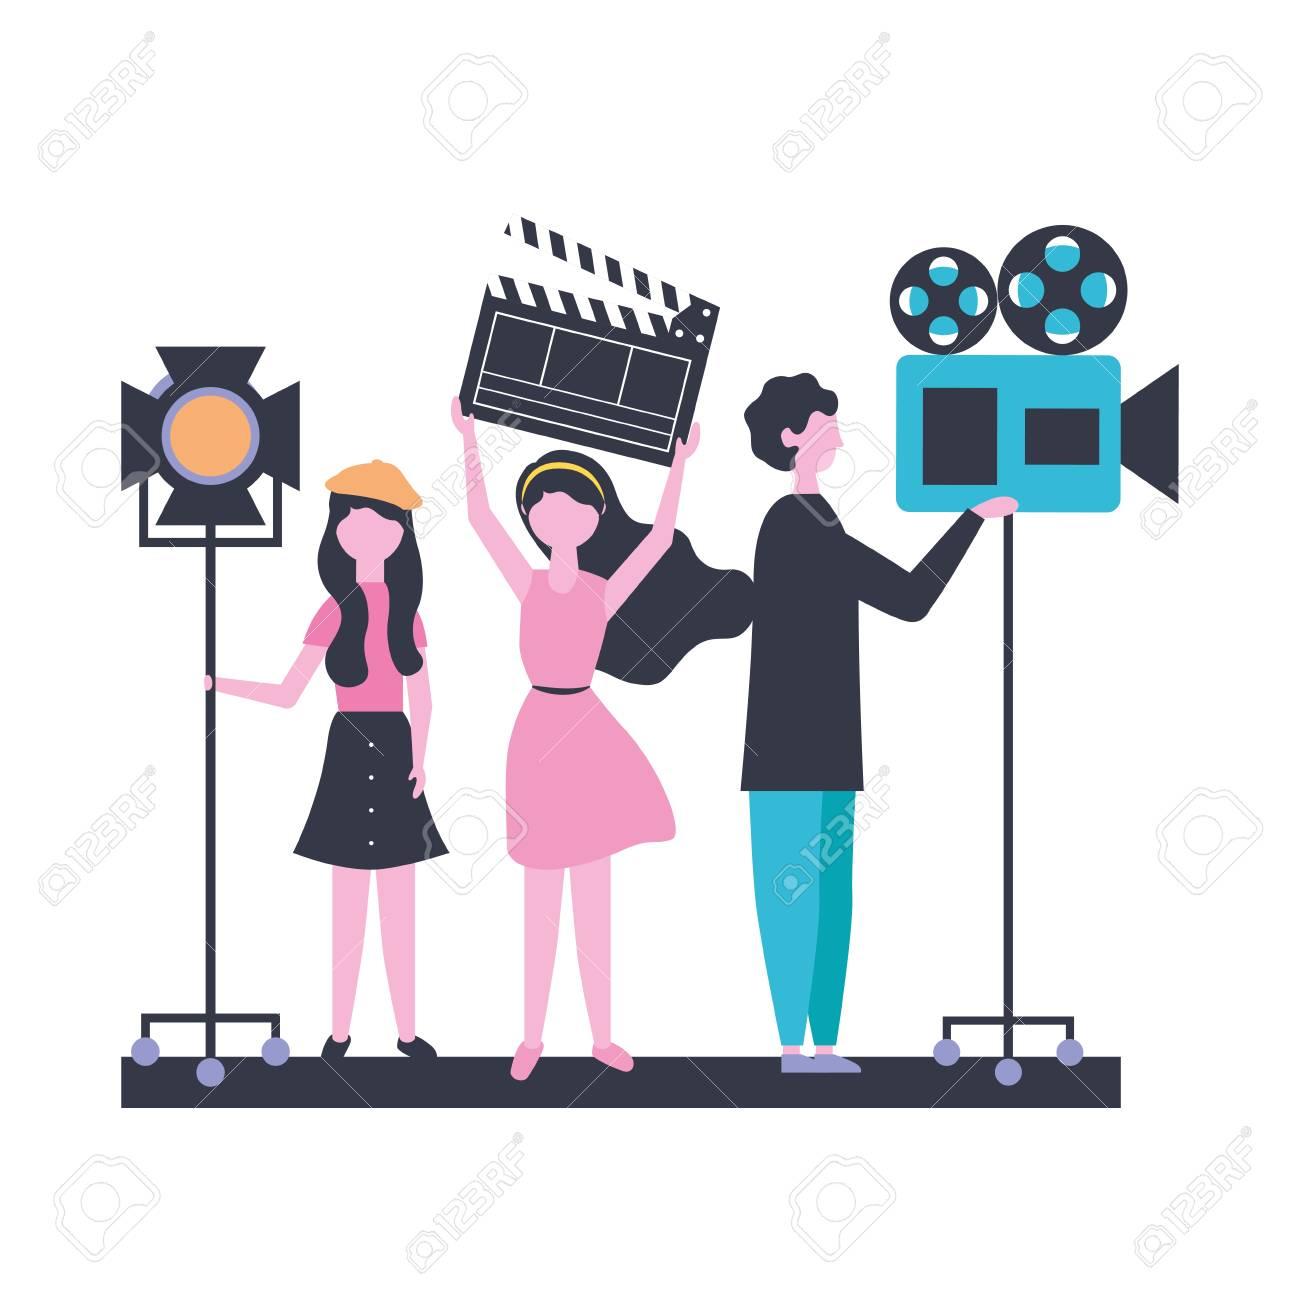 people team production movie film vector illustration - 109940059